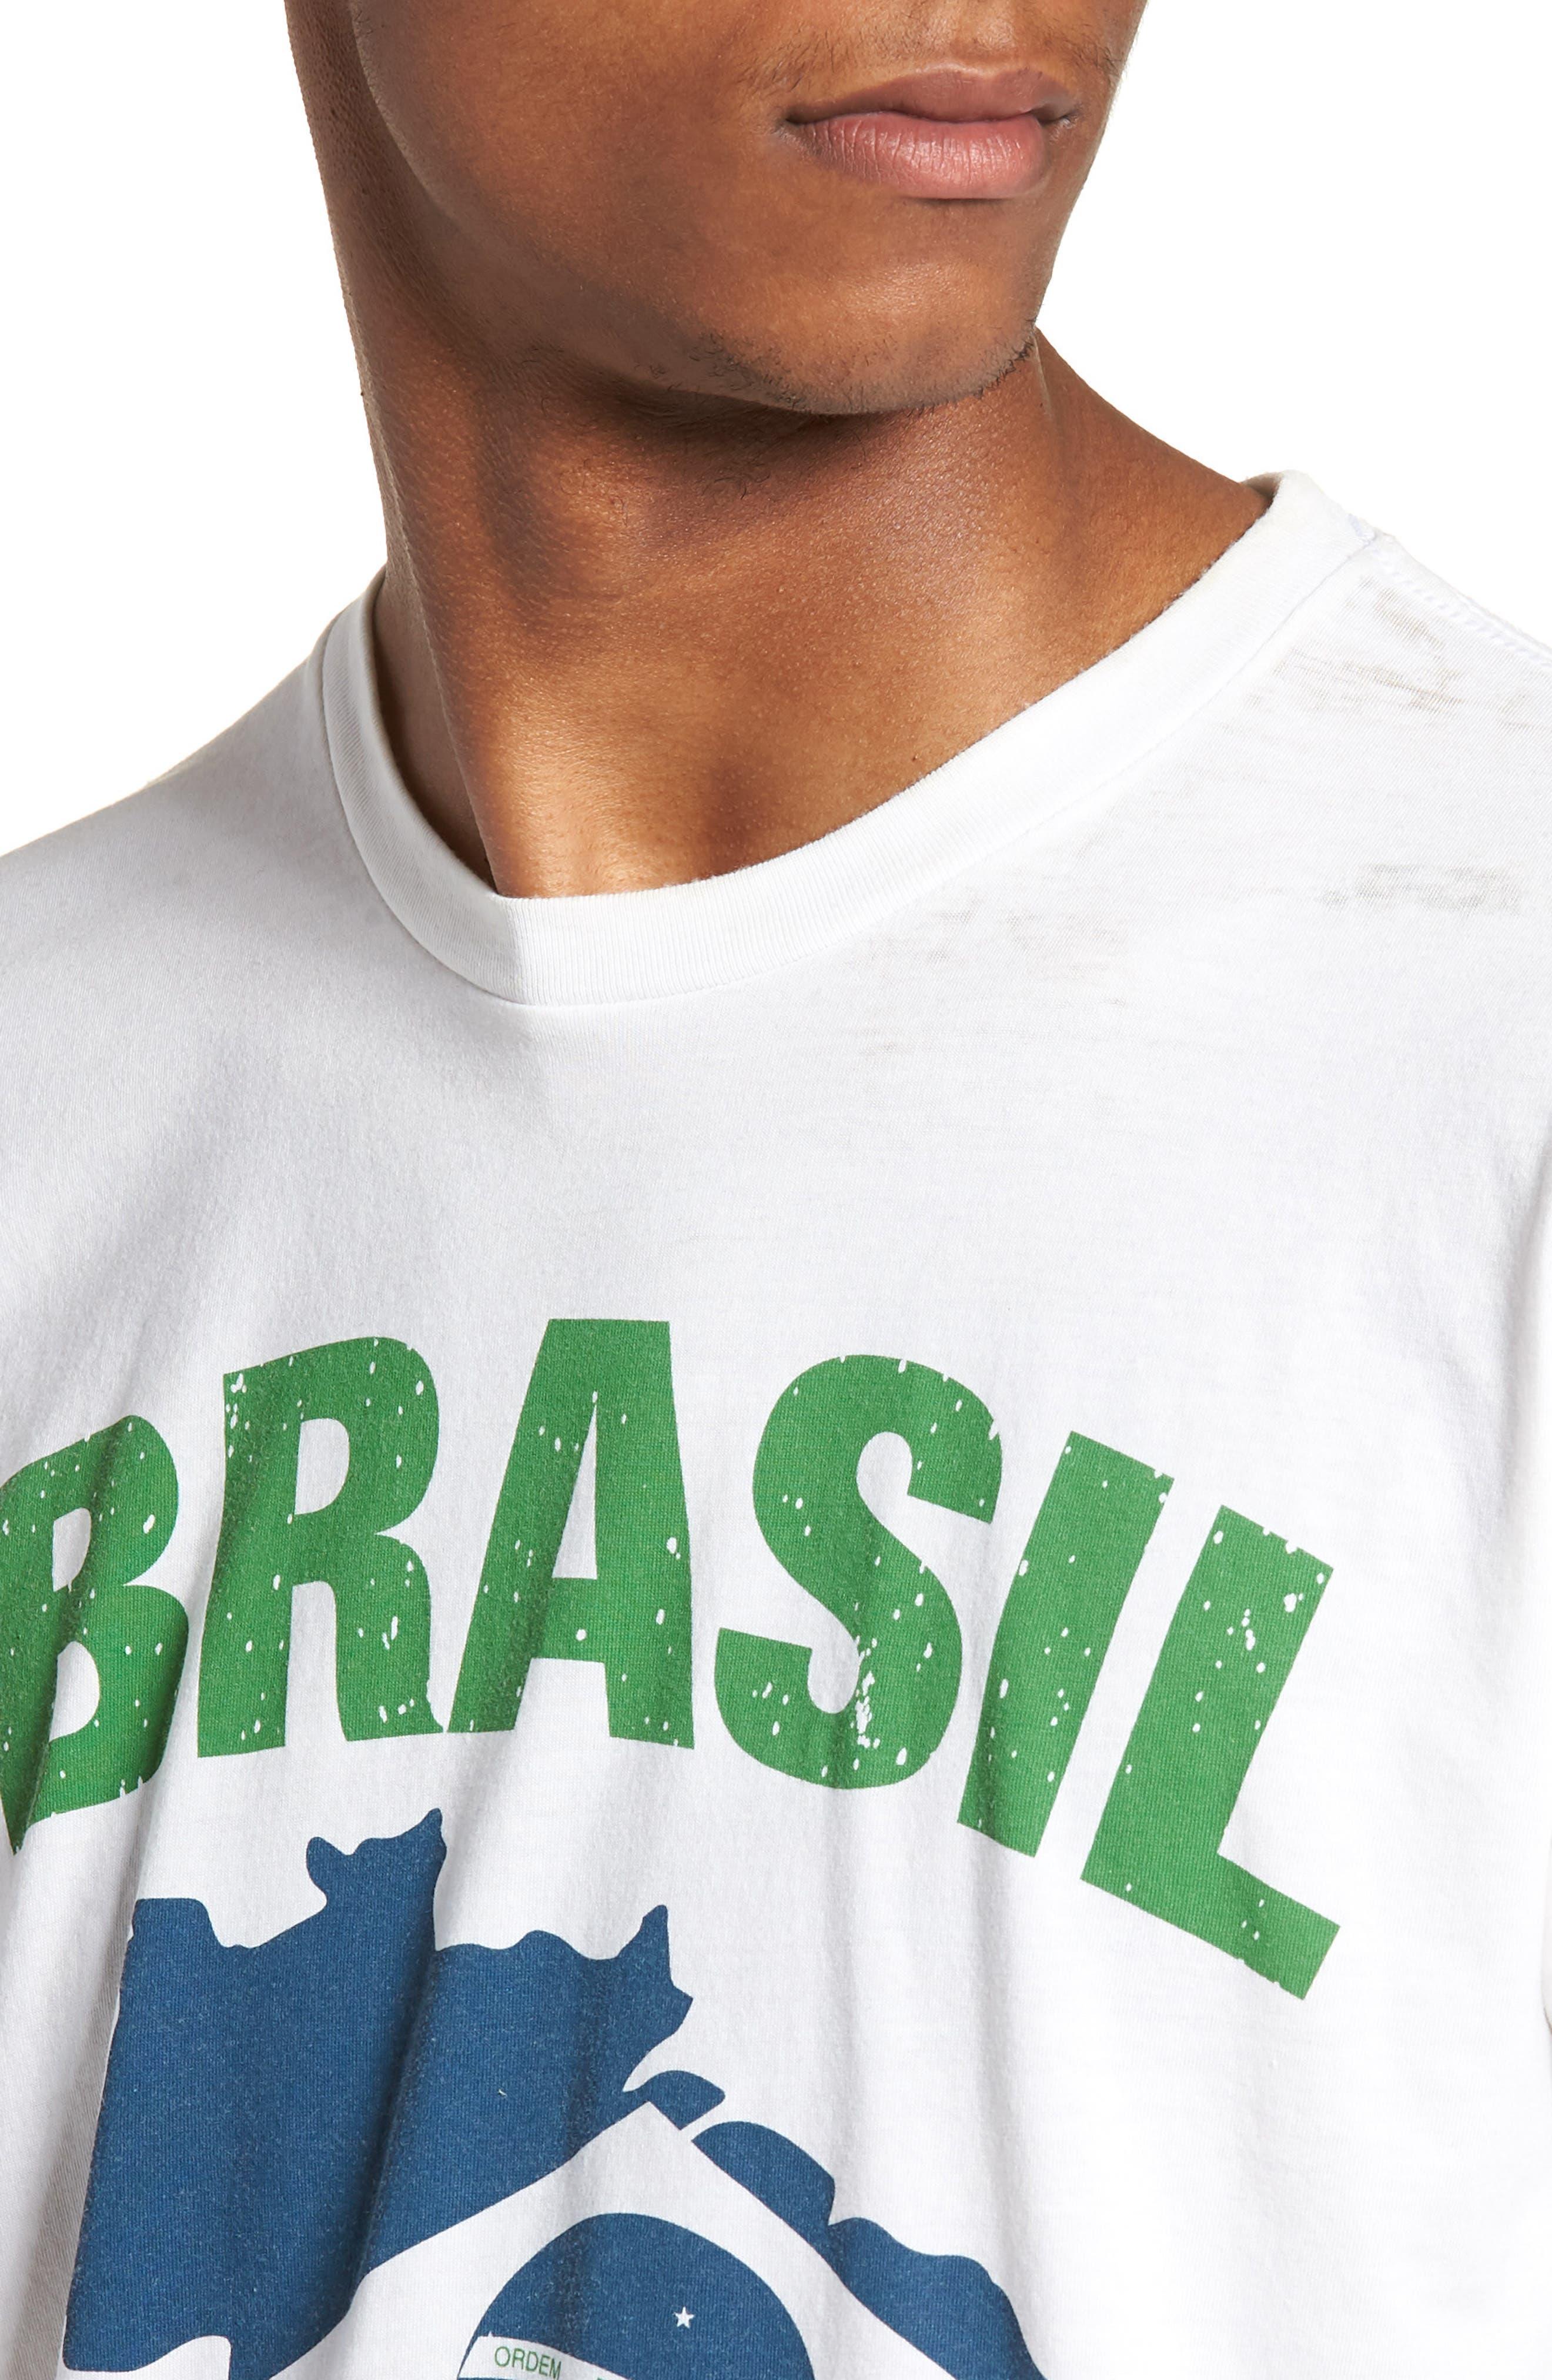 Brasil Futbol T-Shirt,                             Alternate thumbnail 4, color,                             White